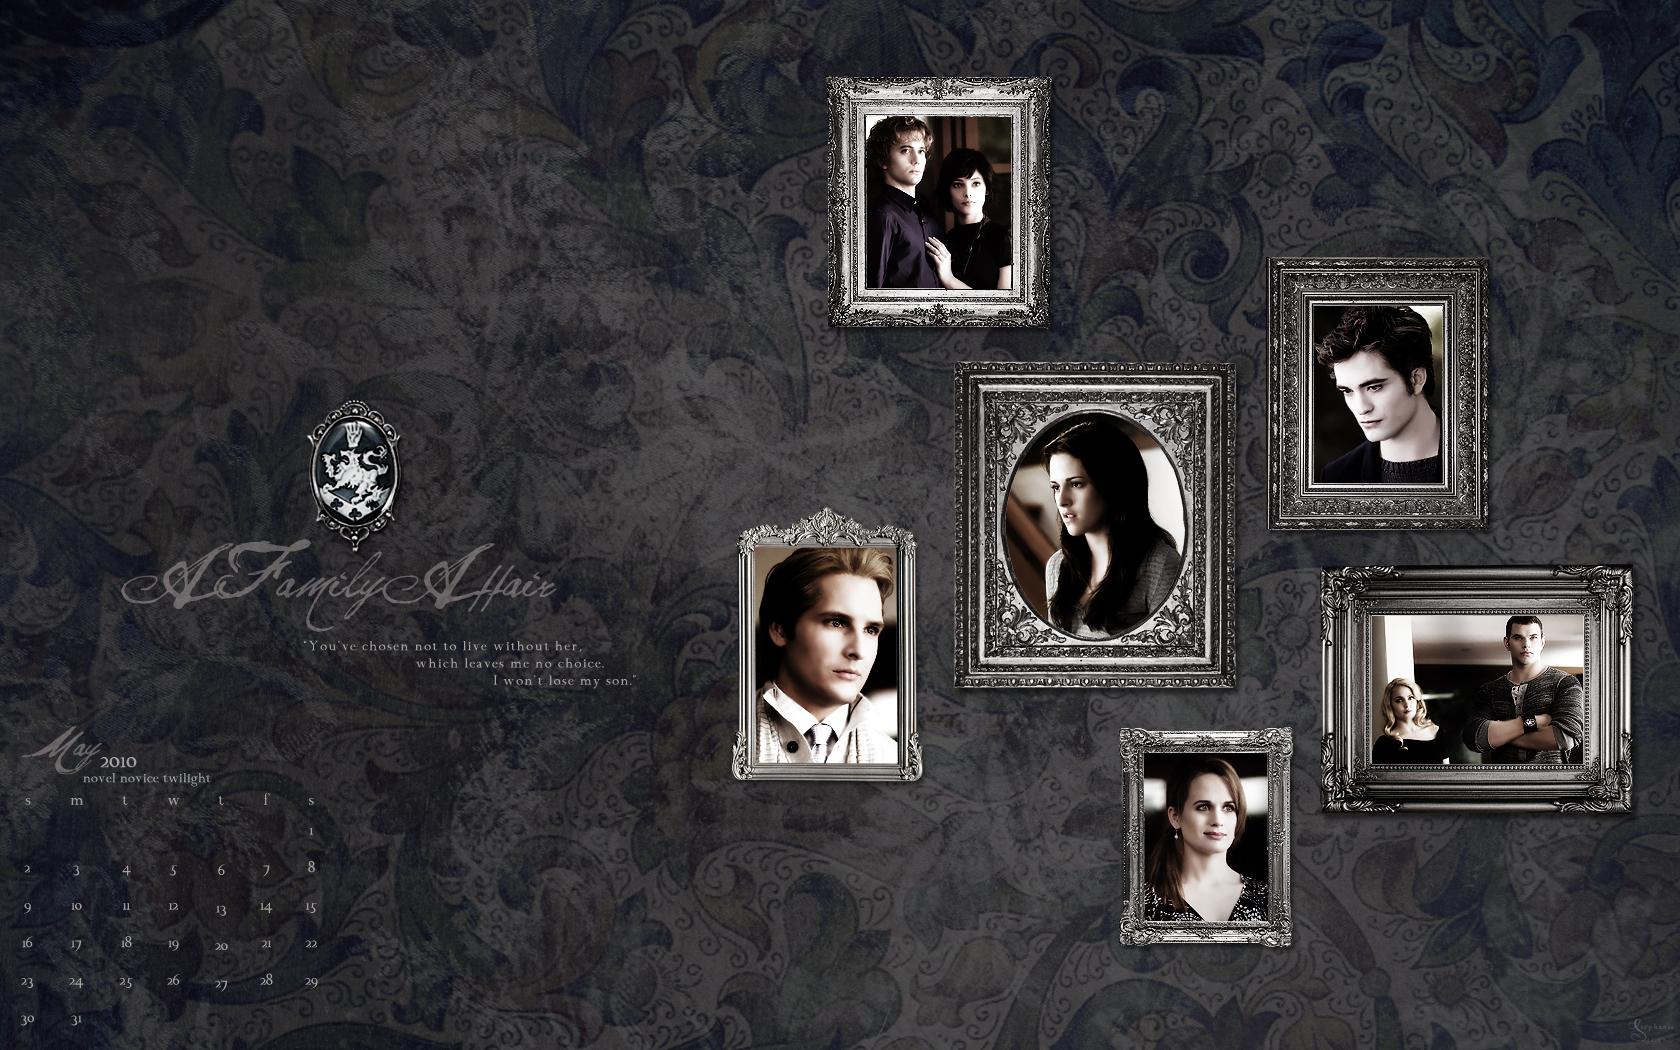 Twilight Saga 2010 Desktop Wallpaper Calendar(from novel noviee twilight)